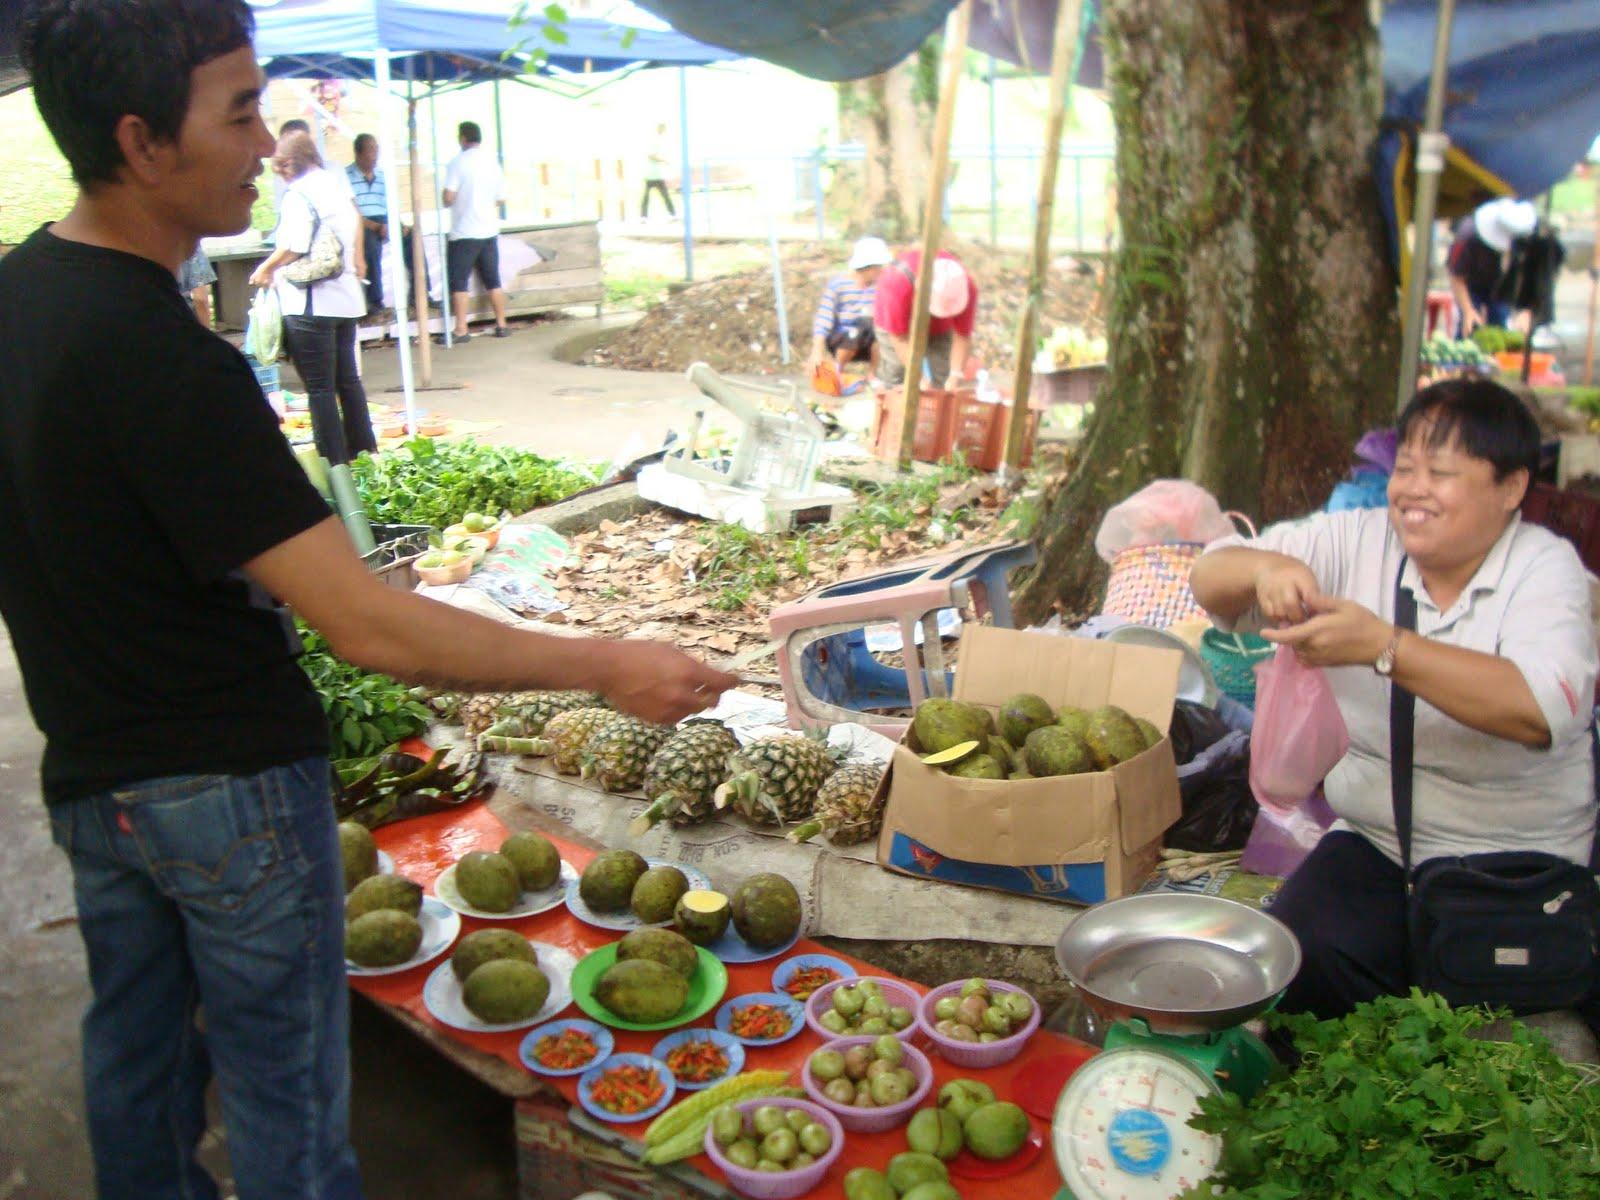 menjual produknya terhadap Collin di Pasar Tamu Sri Aman kelmarin